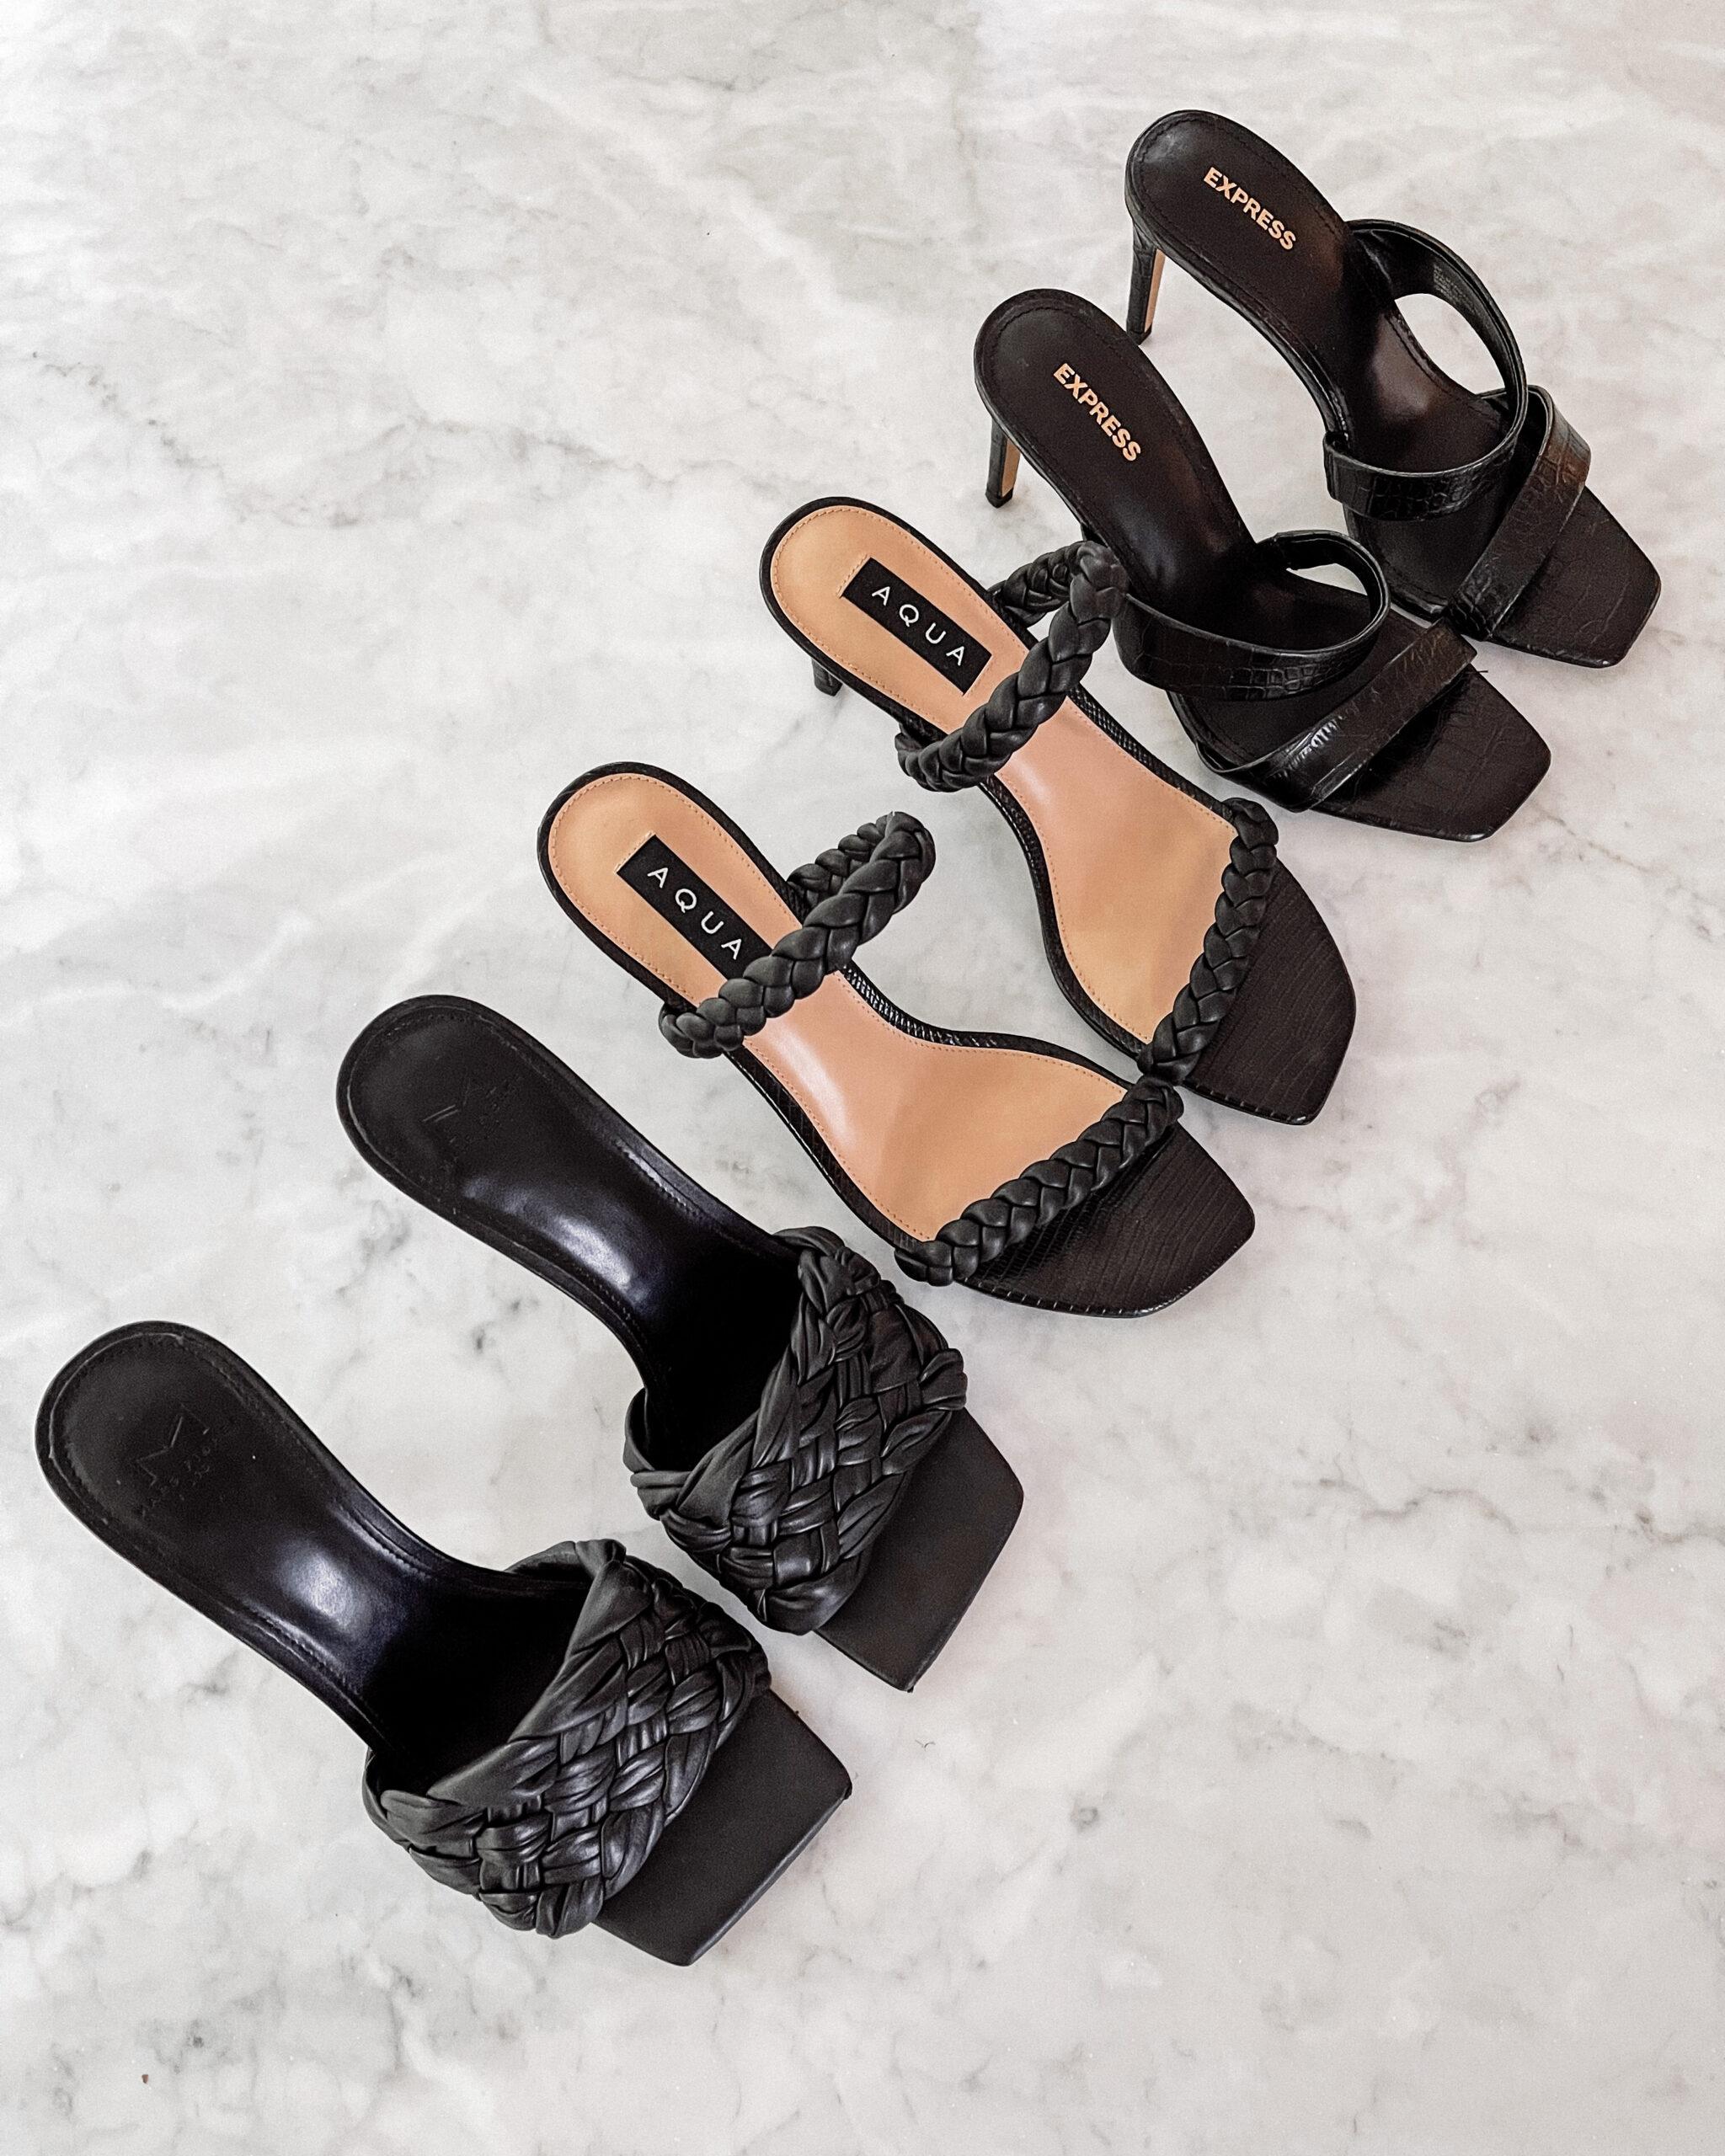 Fashion Jackson dressy summer sandals strappy summer sandal black summer sandals